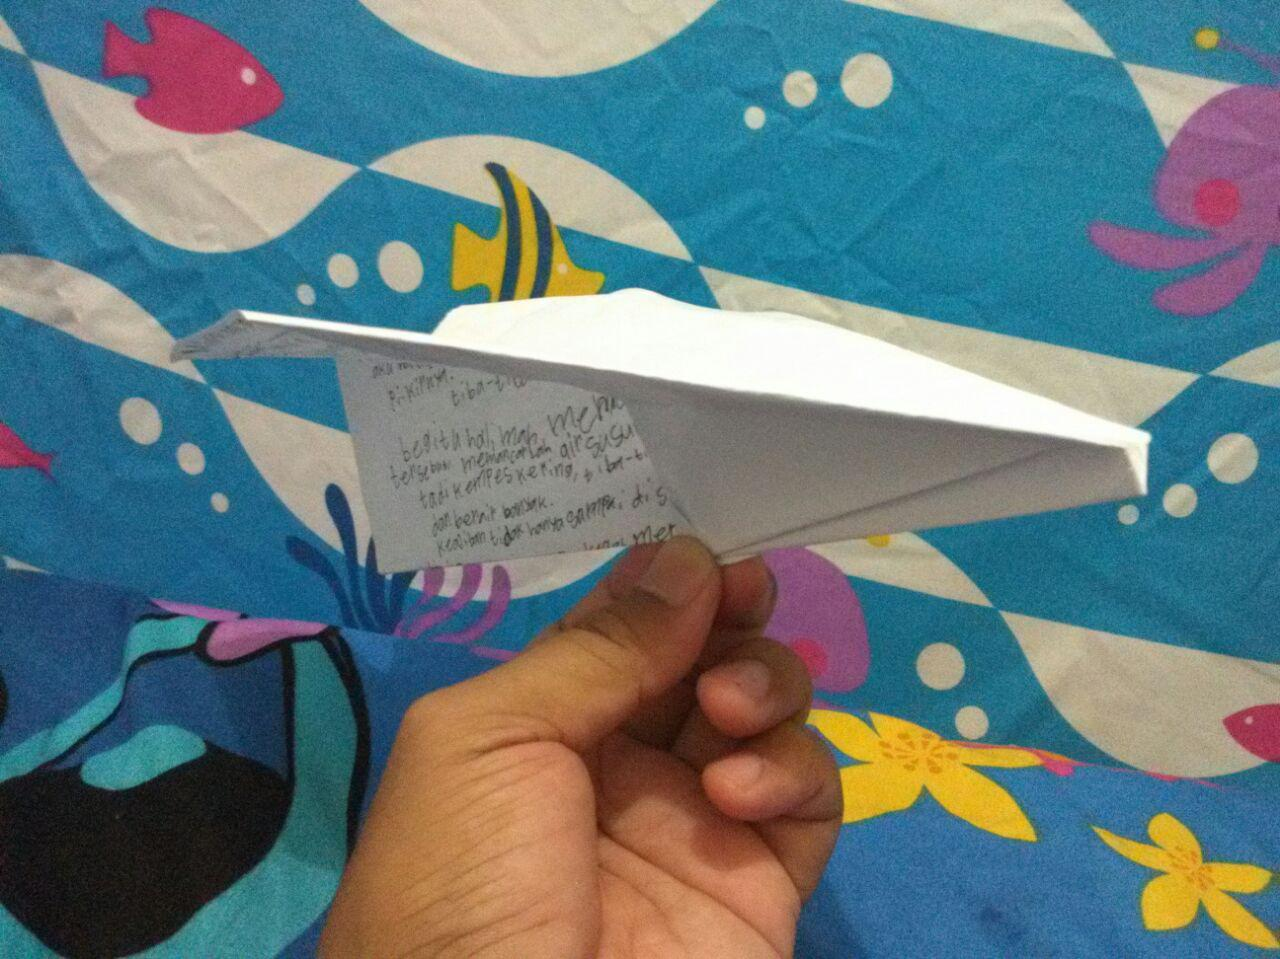 Cara Mudah Membuat Pesawat Terbang dari Kertas Berkas